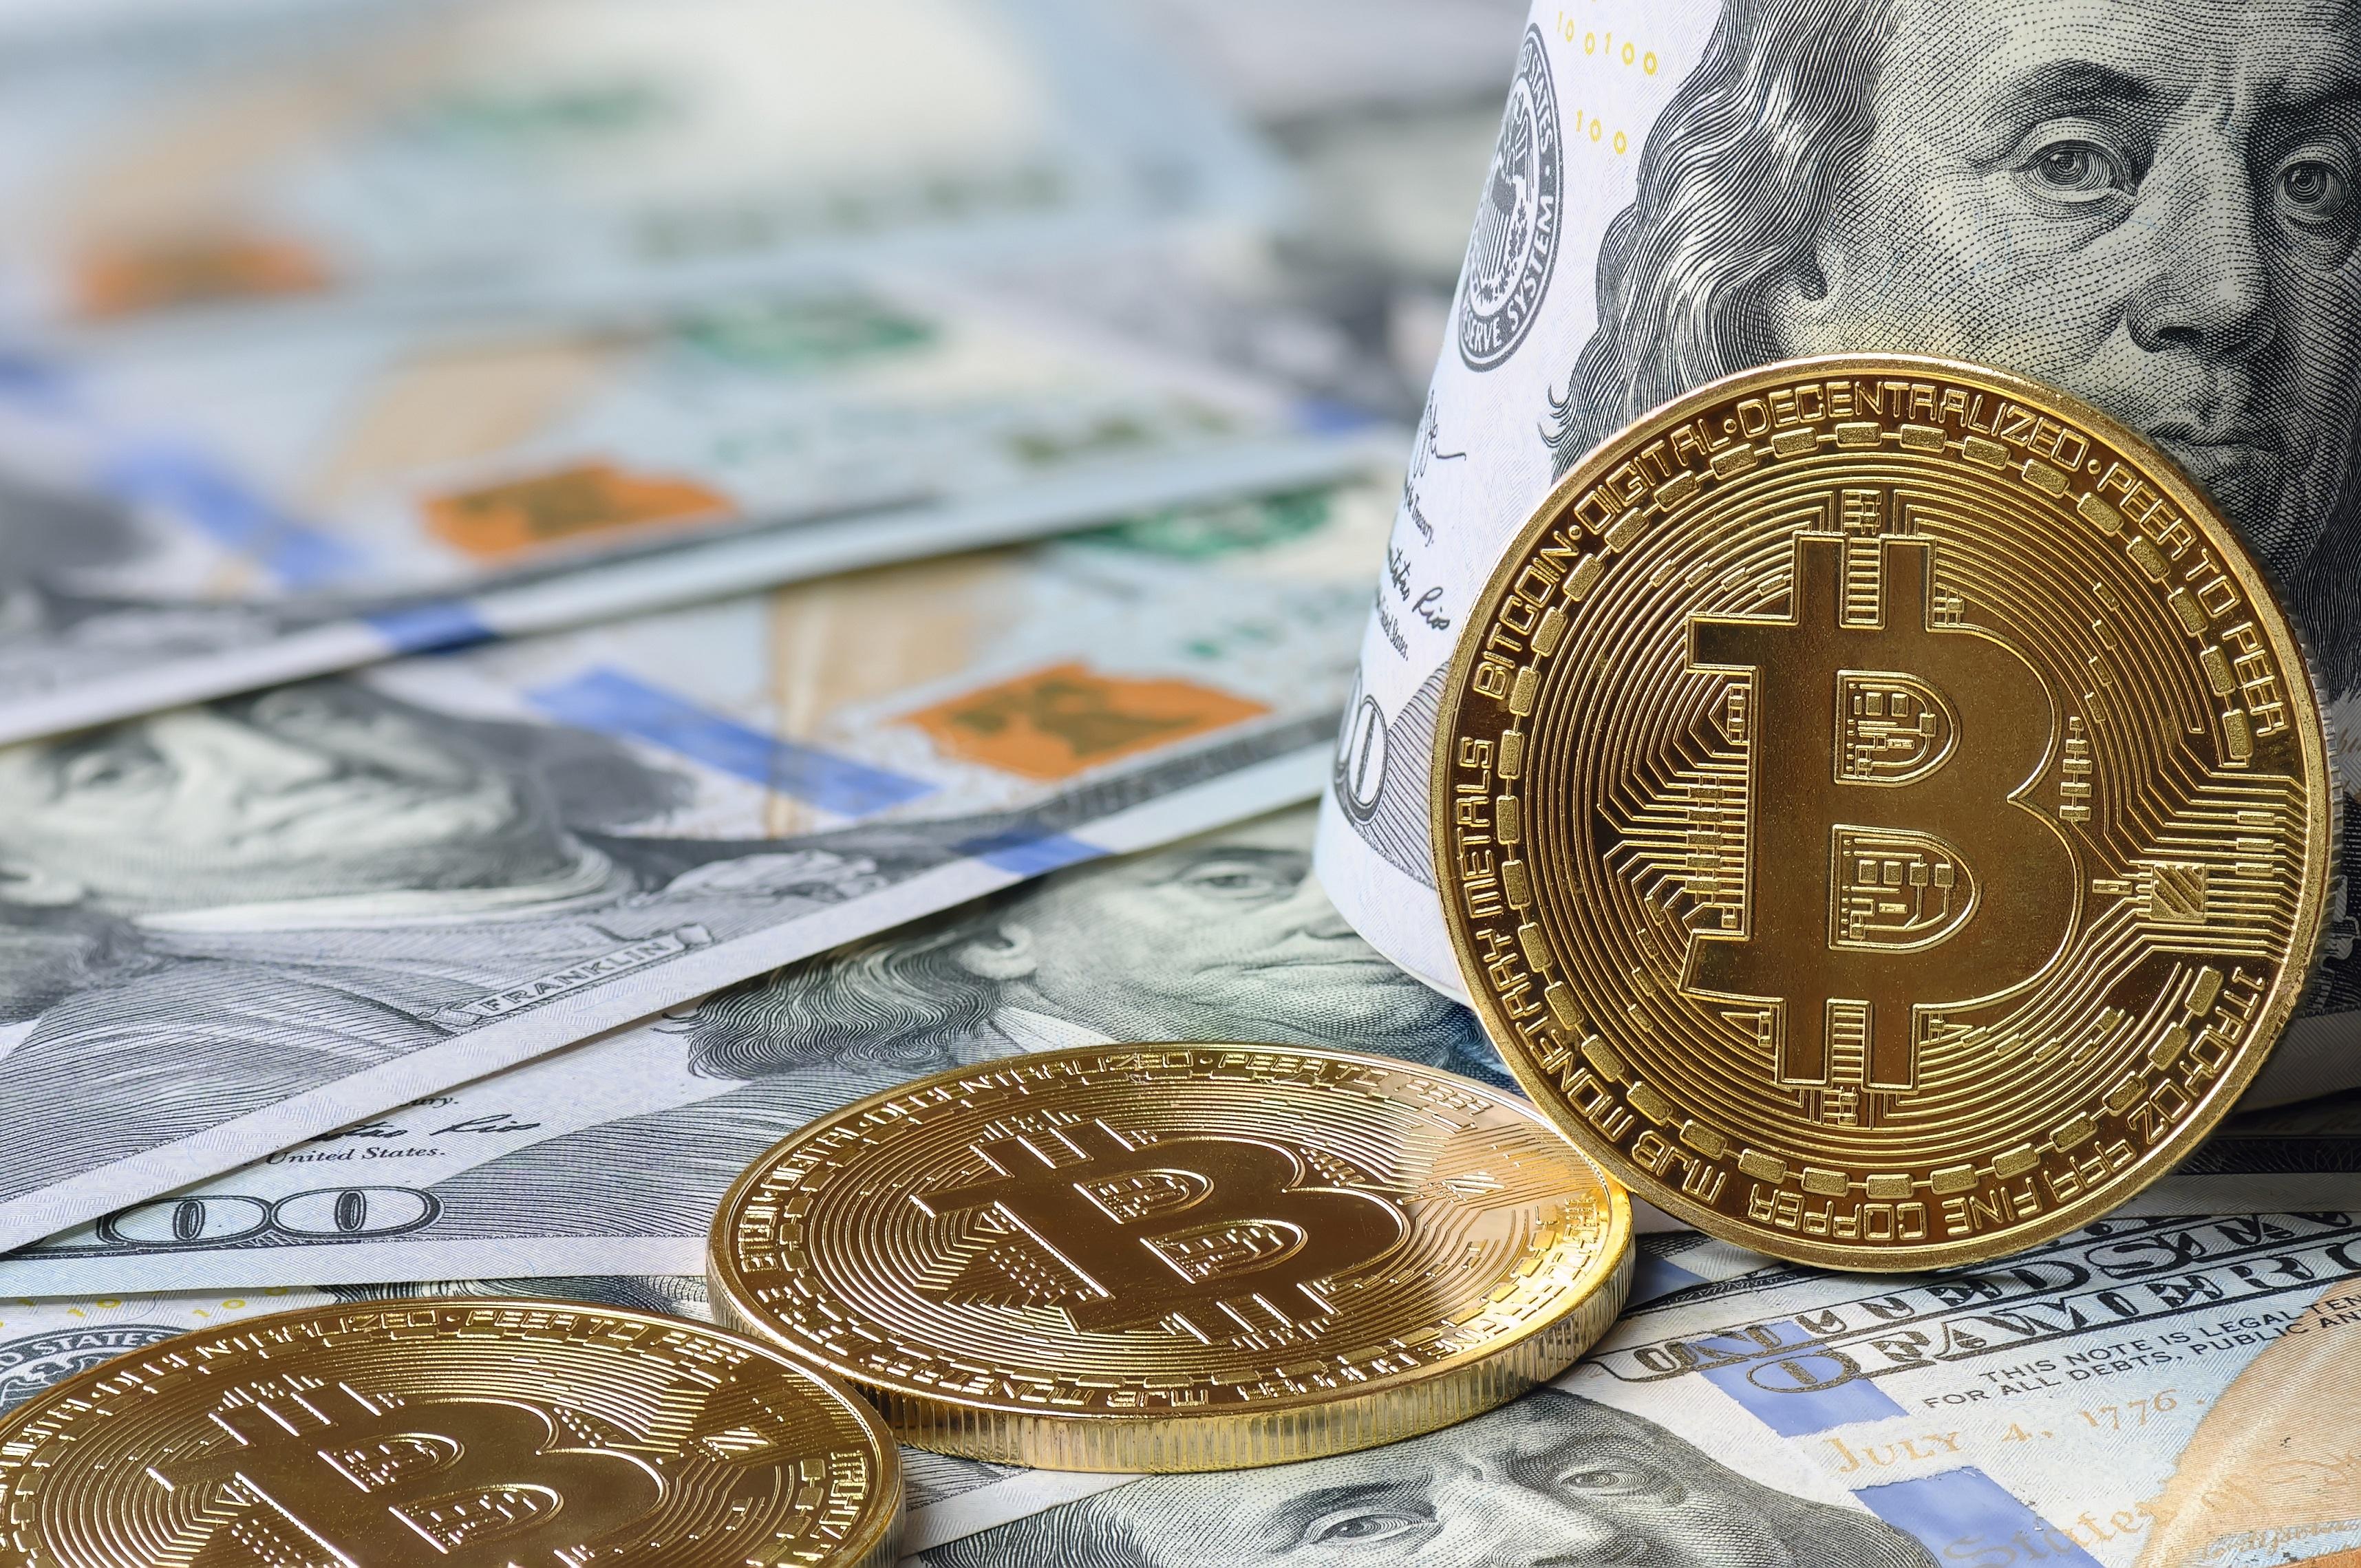 donald trump investit dans le bitcoin